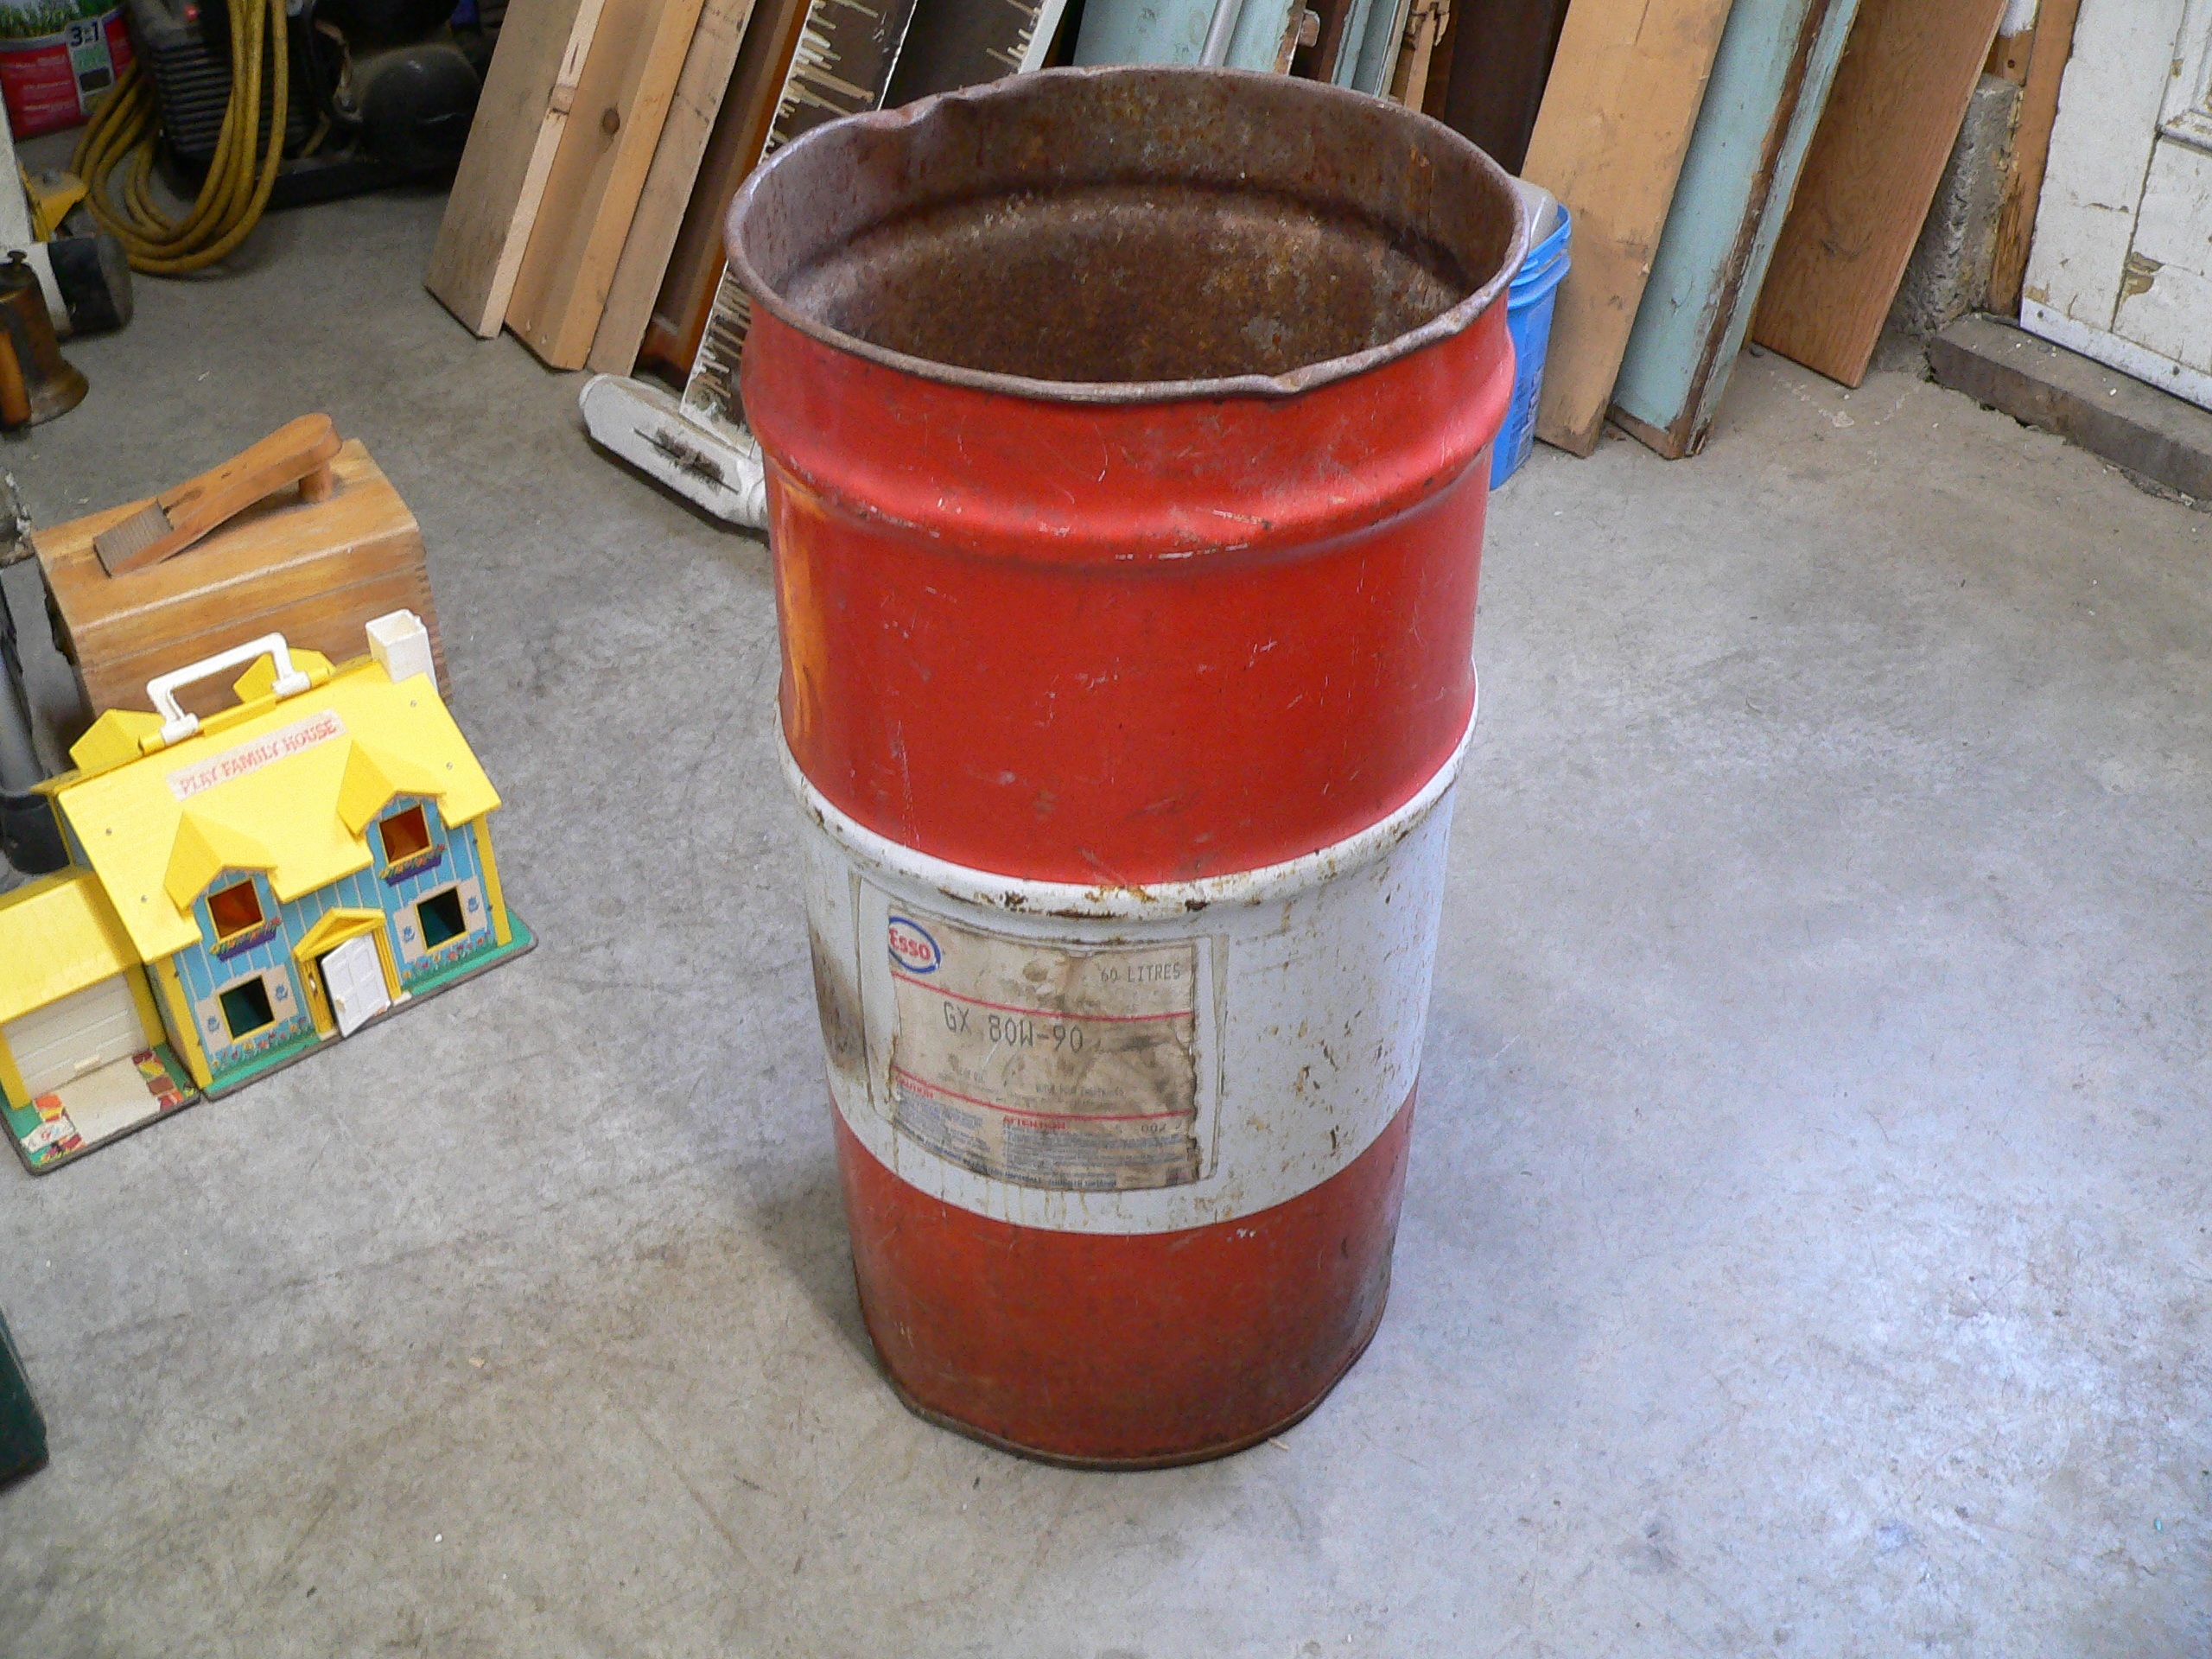 Vieux bidon en métal Esso # 5461